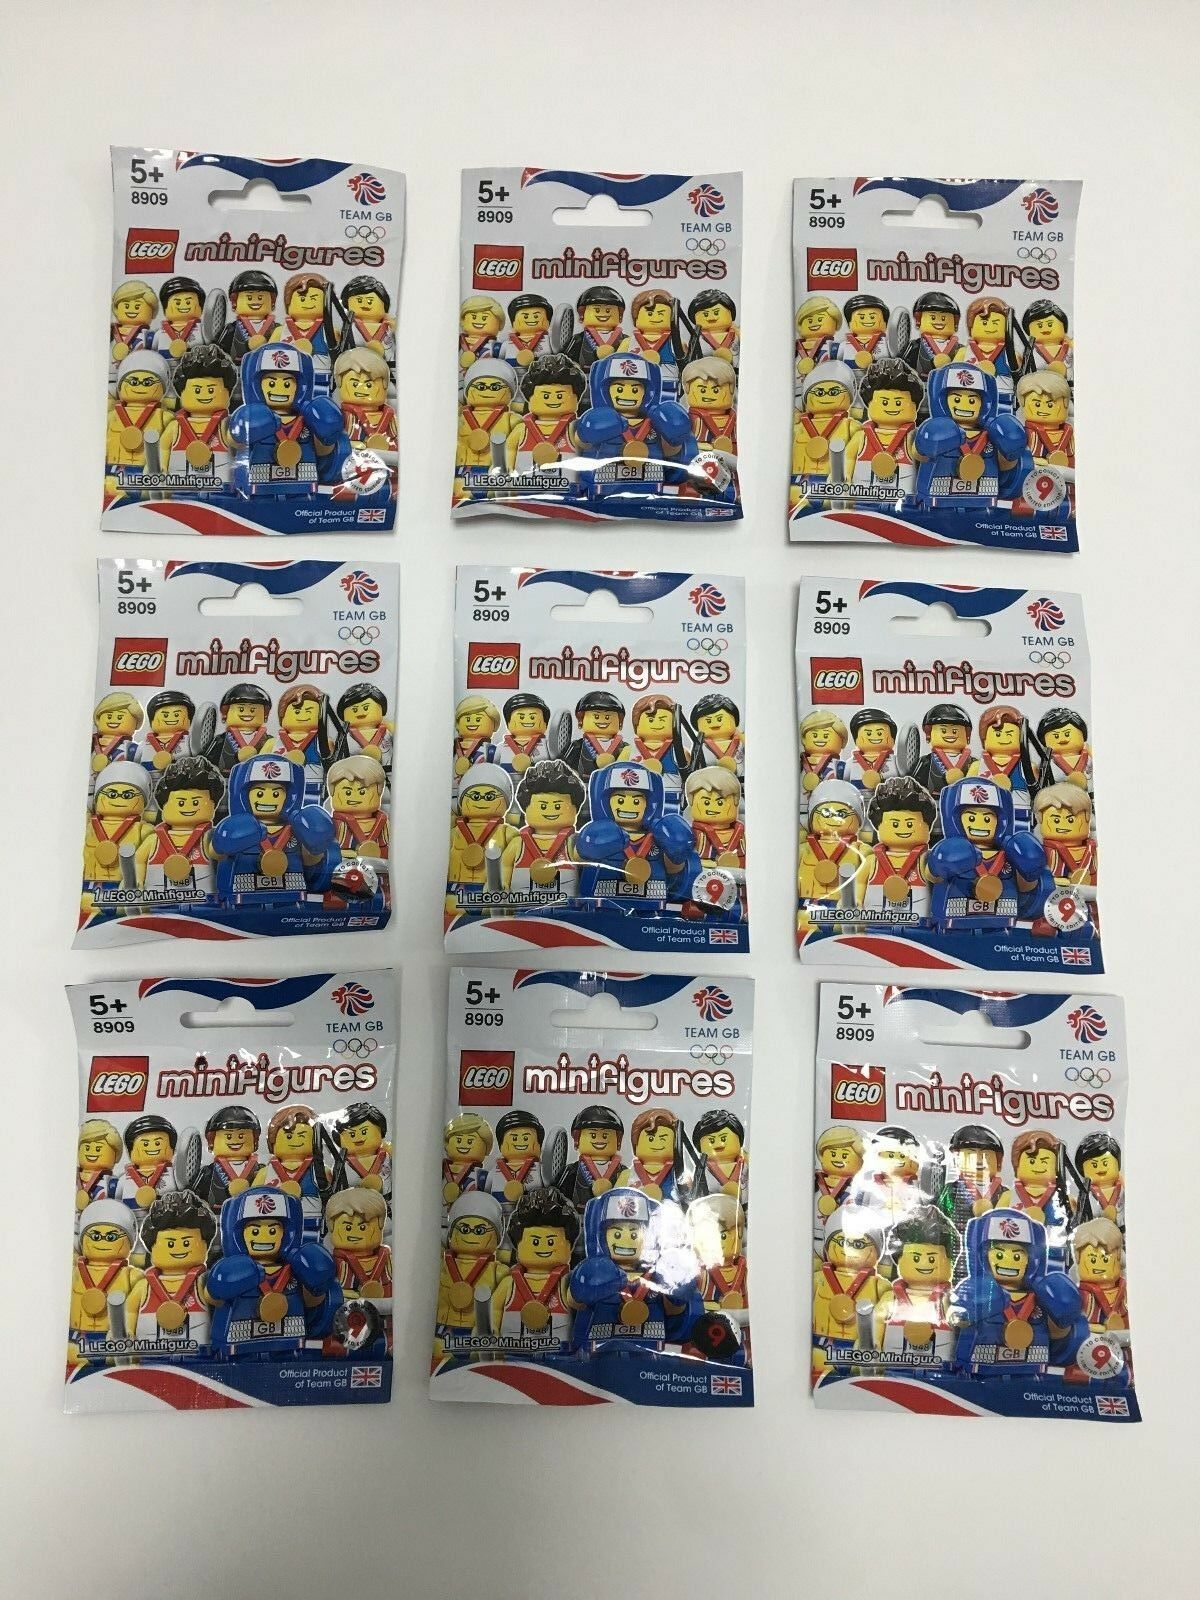 LEGO Minifigures Team GB Olympic Minifigure - 8909 - All Brand New & Unopened